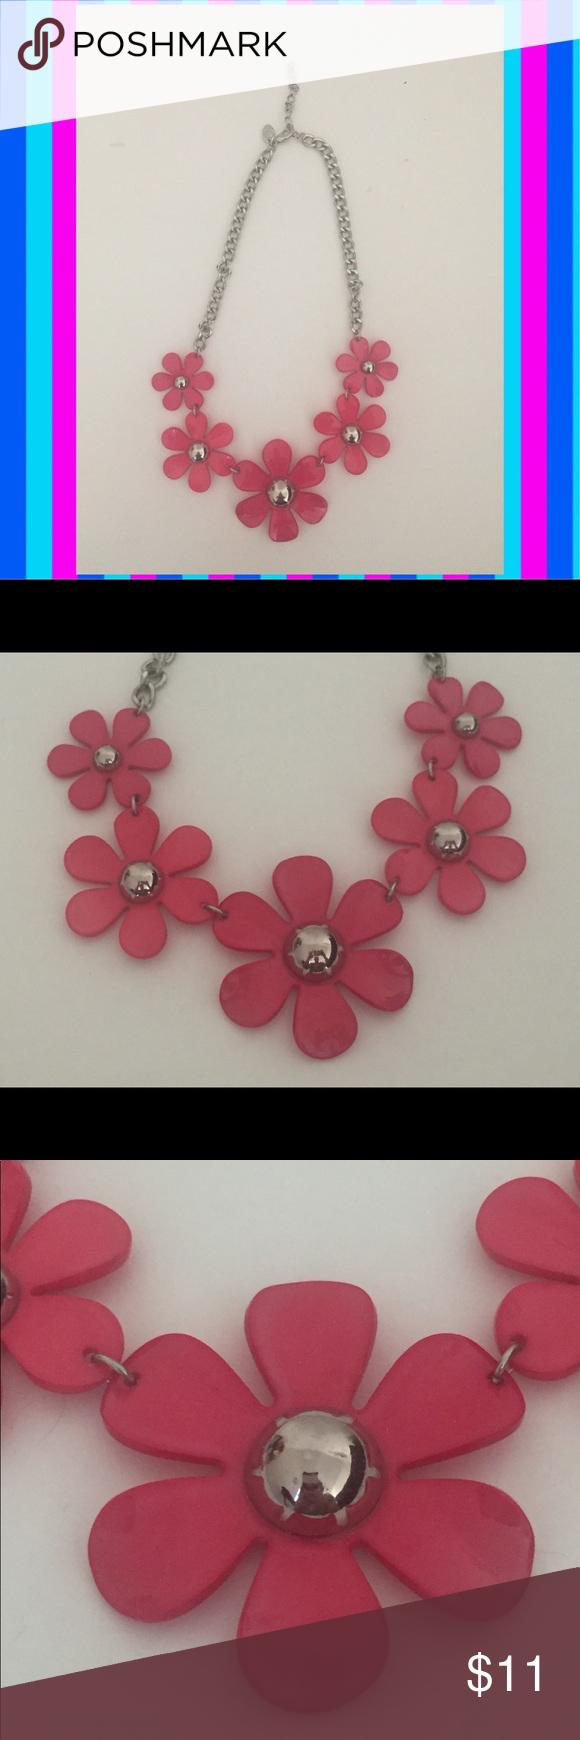 Charming Charlie Silver Fuchsia Flower Necklace Charming Charlie Jewelry Fuchsia Flower Fuchsia